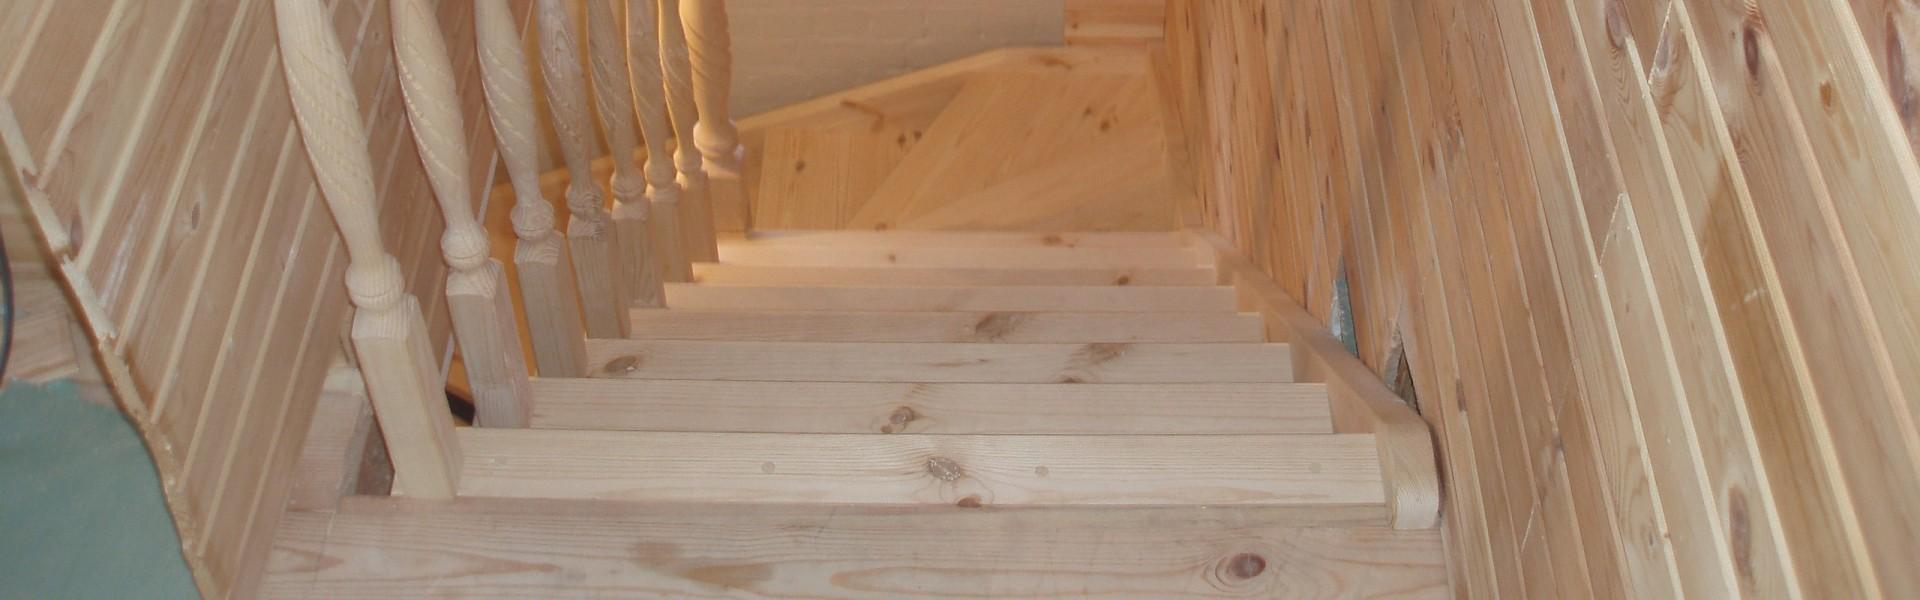 Лестницы, Двери, Окна на заказ. Пиломатериал в наличие и на заказ +7(906)613-28-01